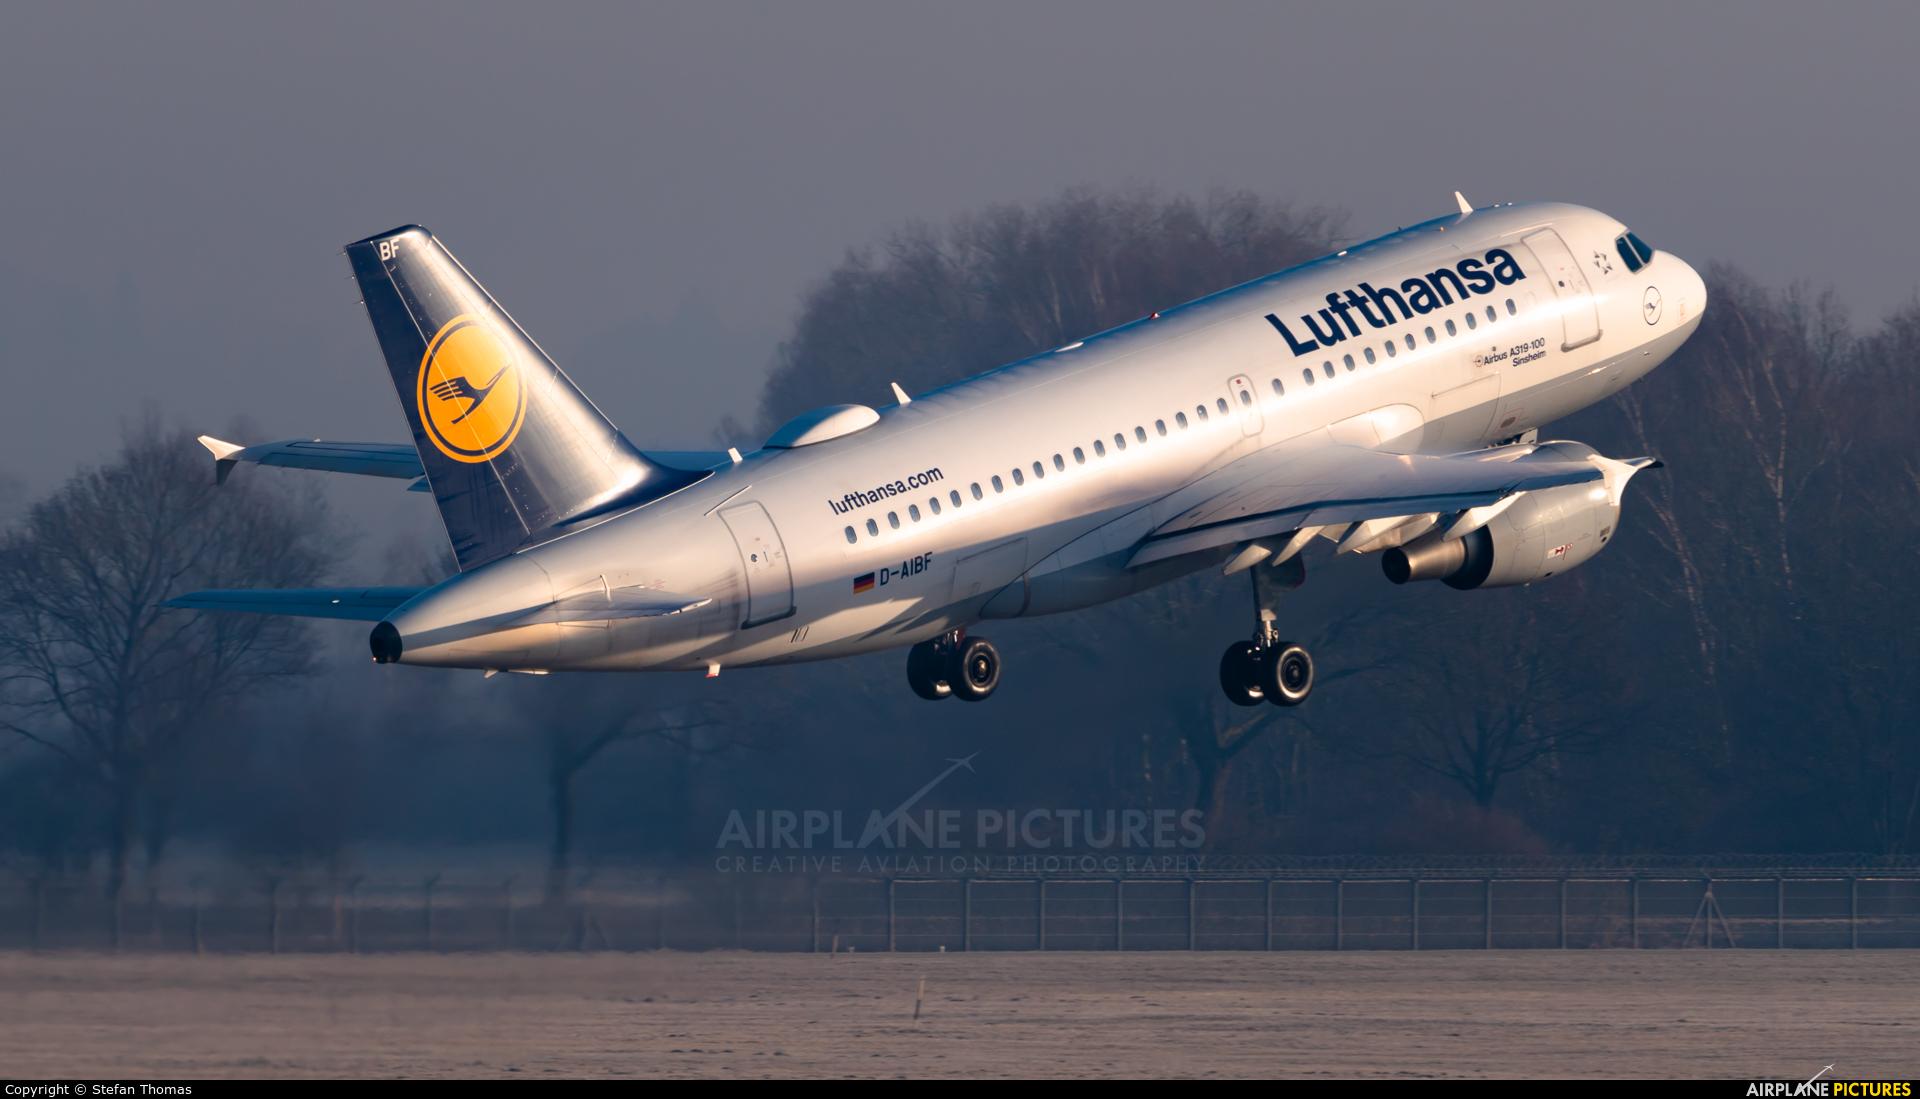 Lufthansa D-AIBF aircraft at Munich